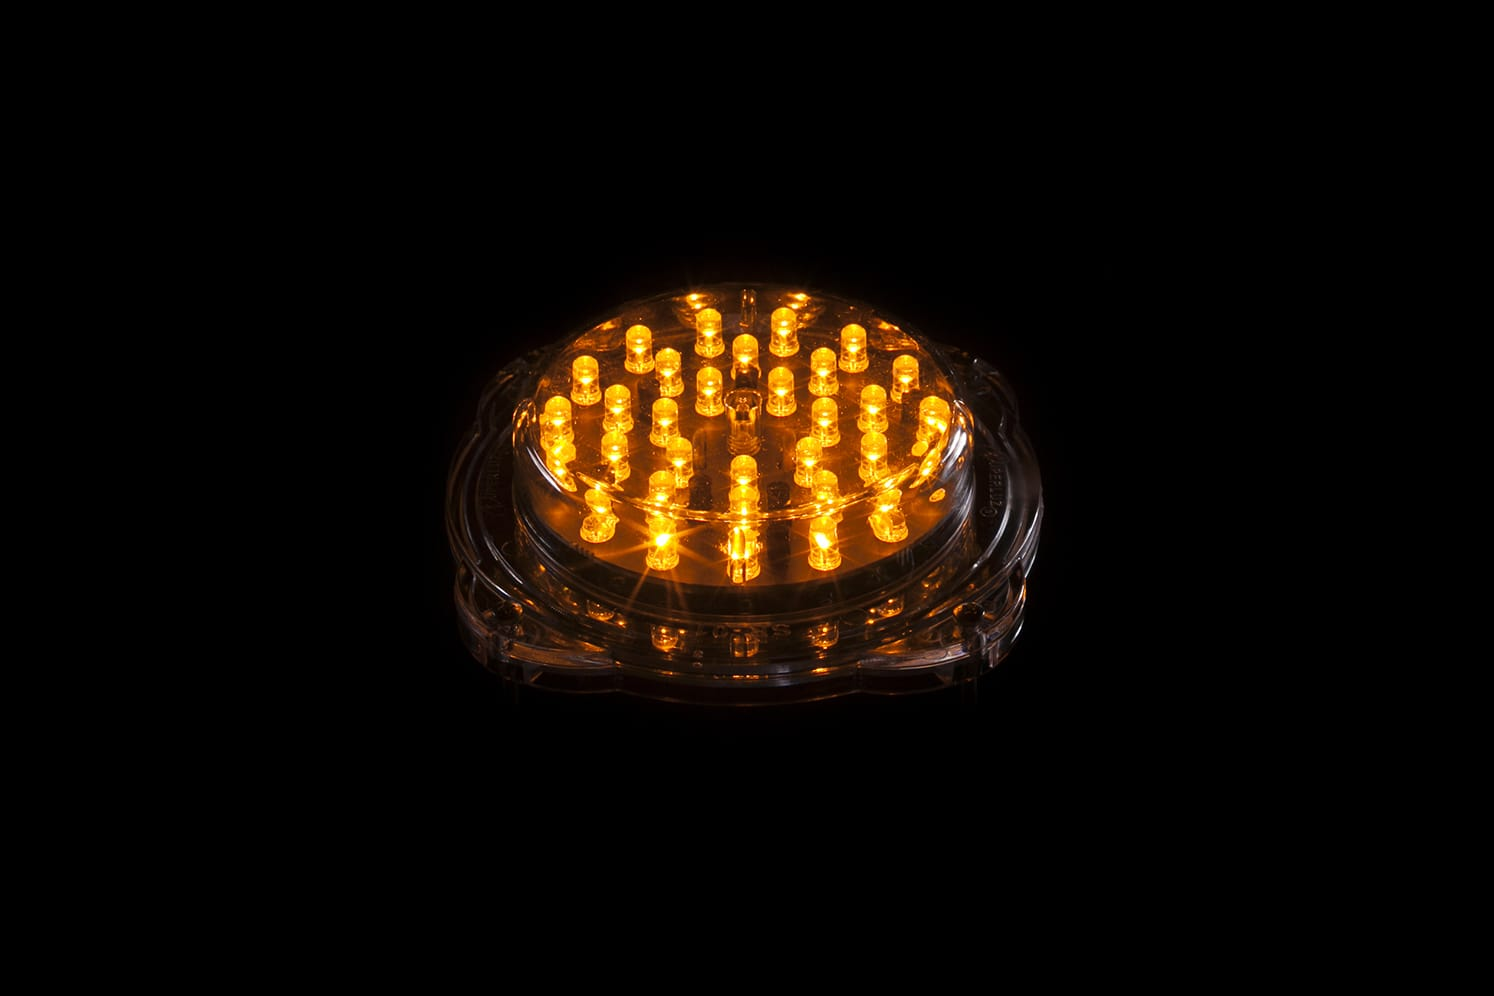 Signalisation LED verticale balise basse tension ECO-801 32 LED ambre